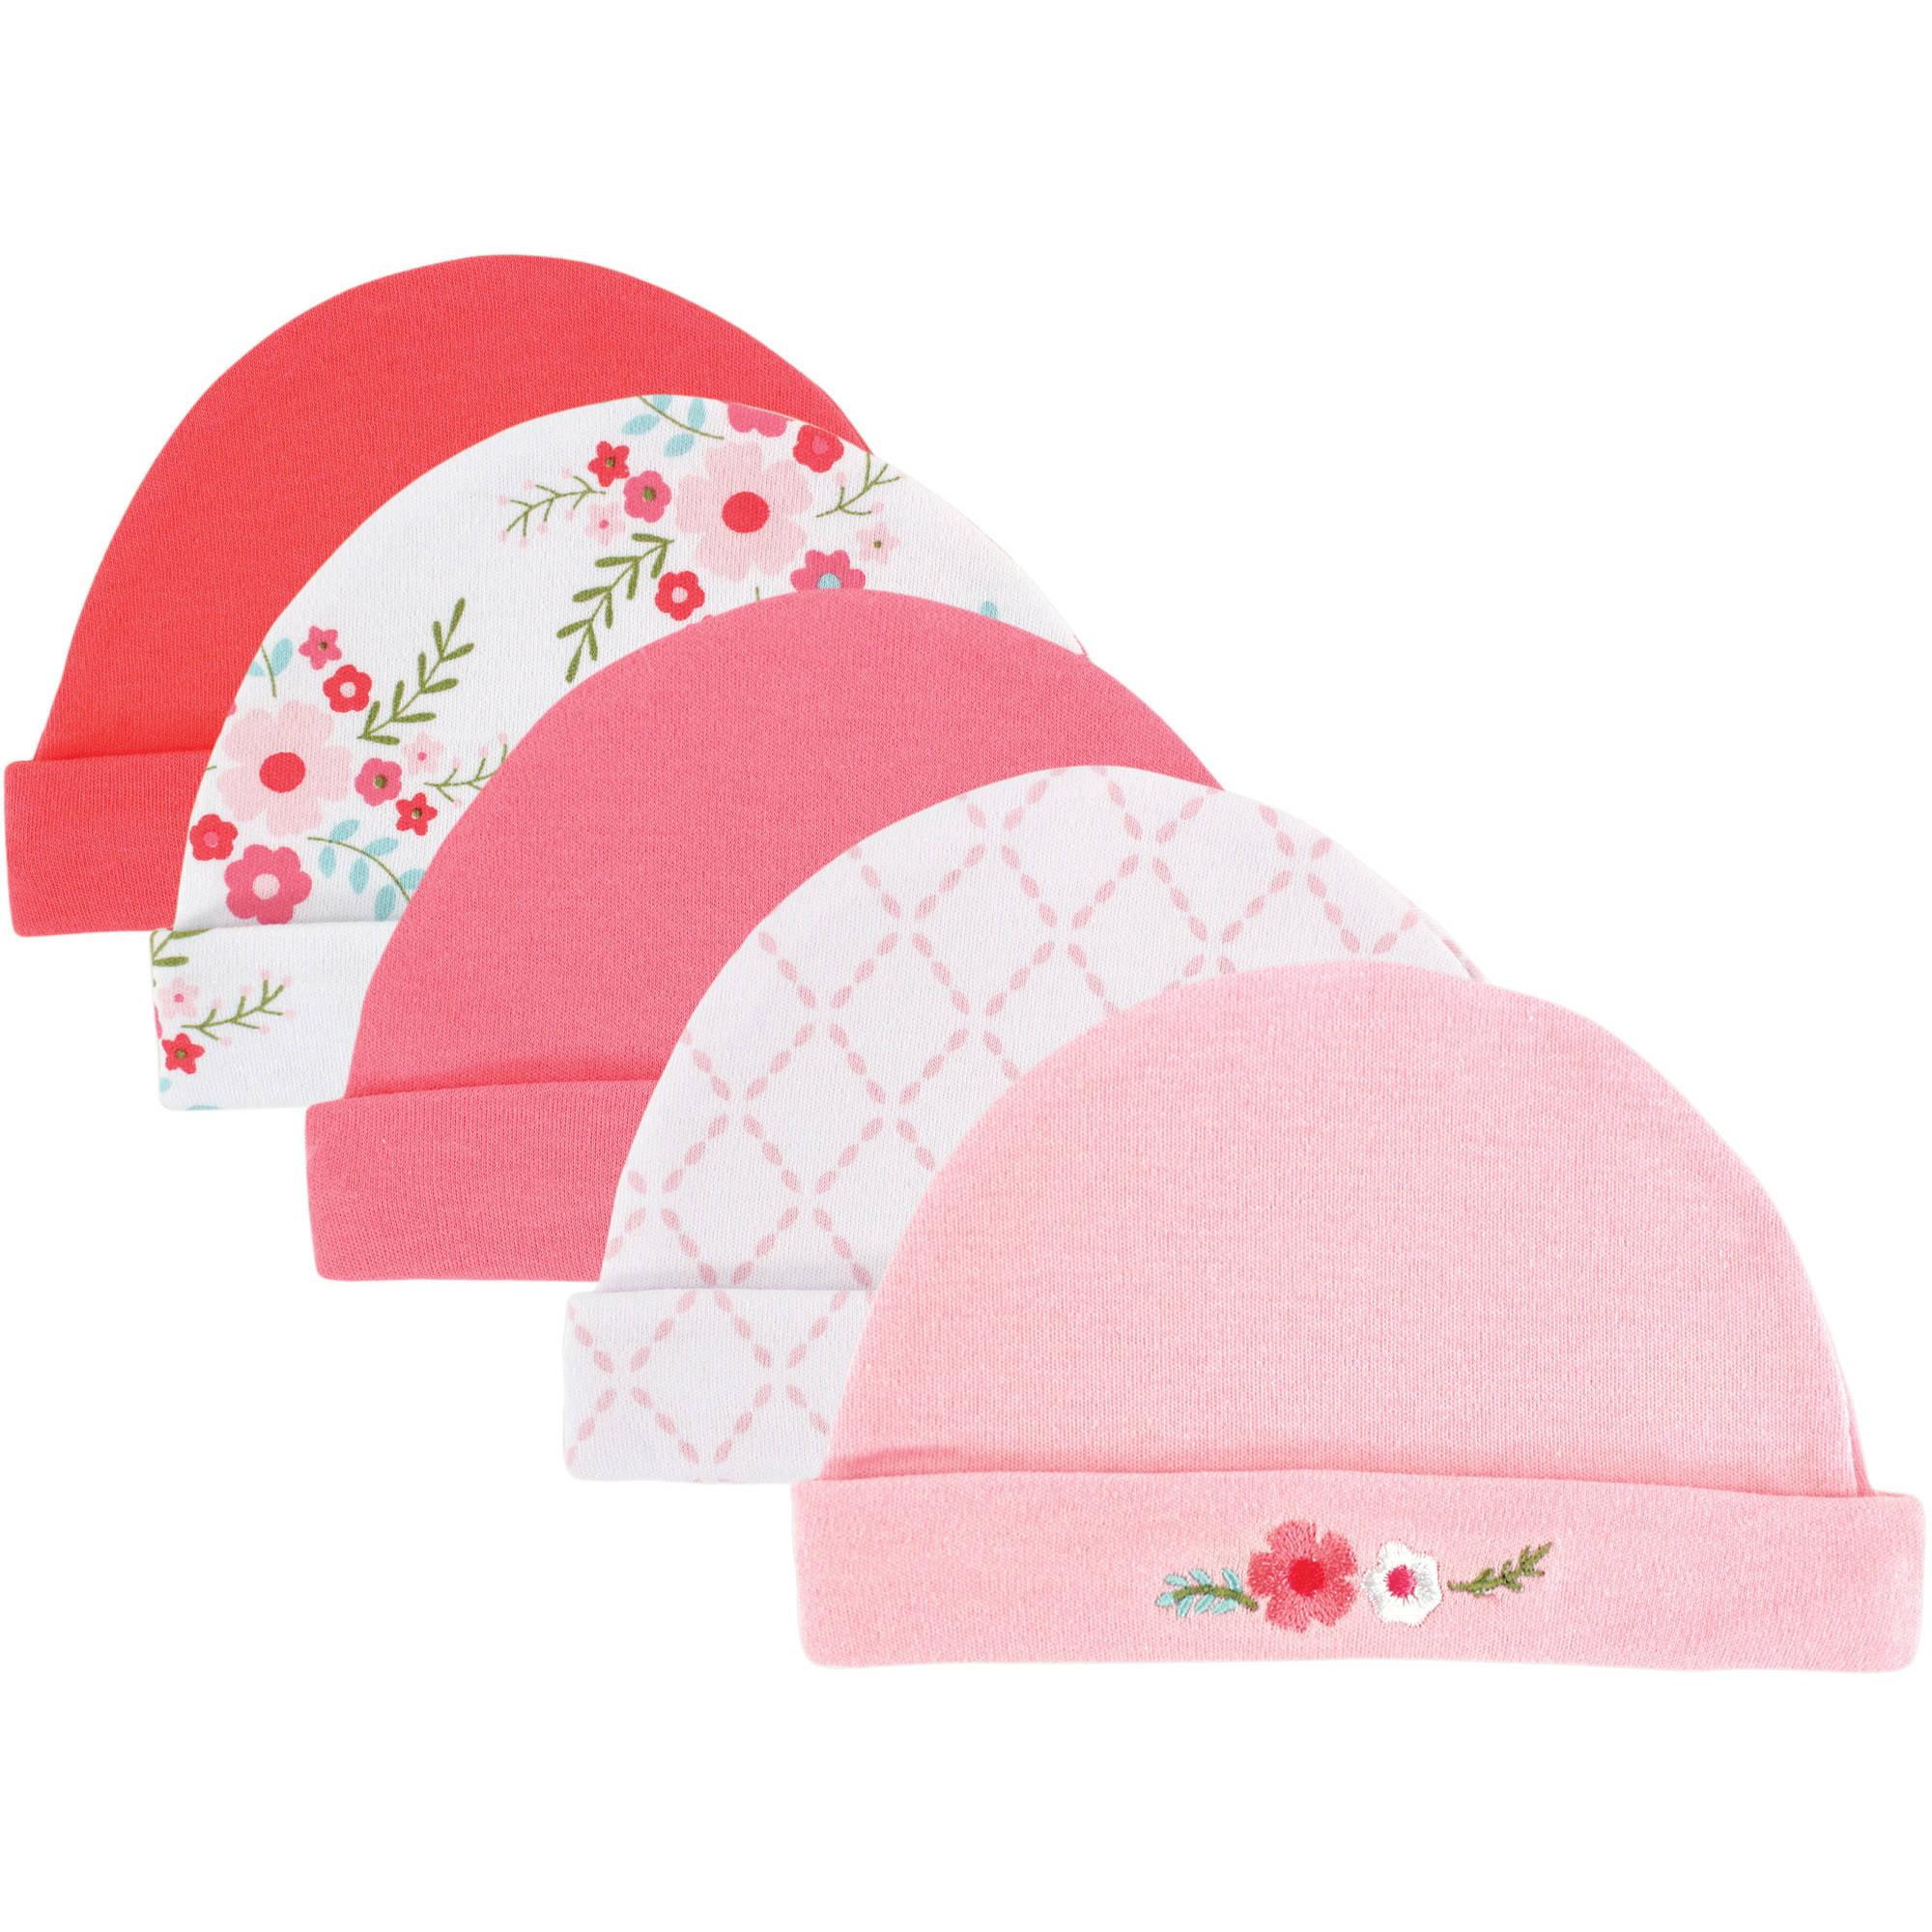 Luvable Friends Newborn Baby Girls Cap 5-Pack - Floral, 0-6 months